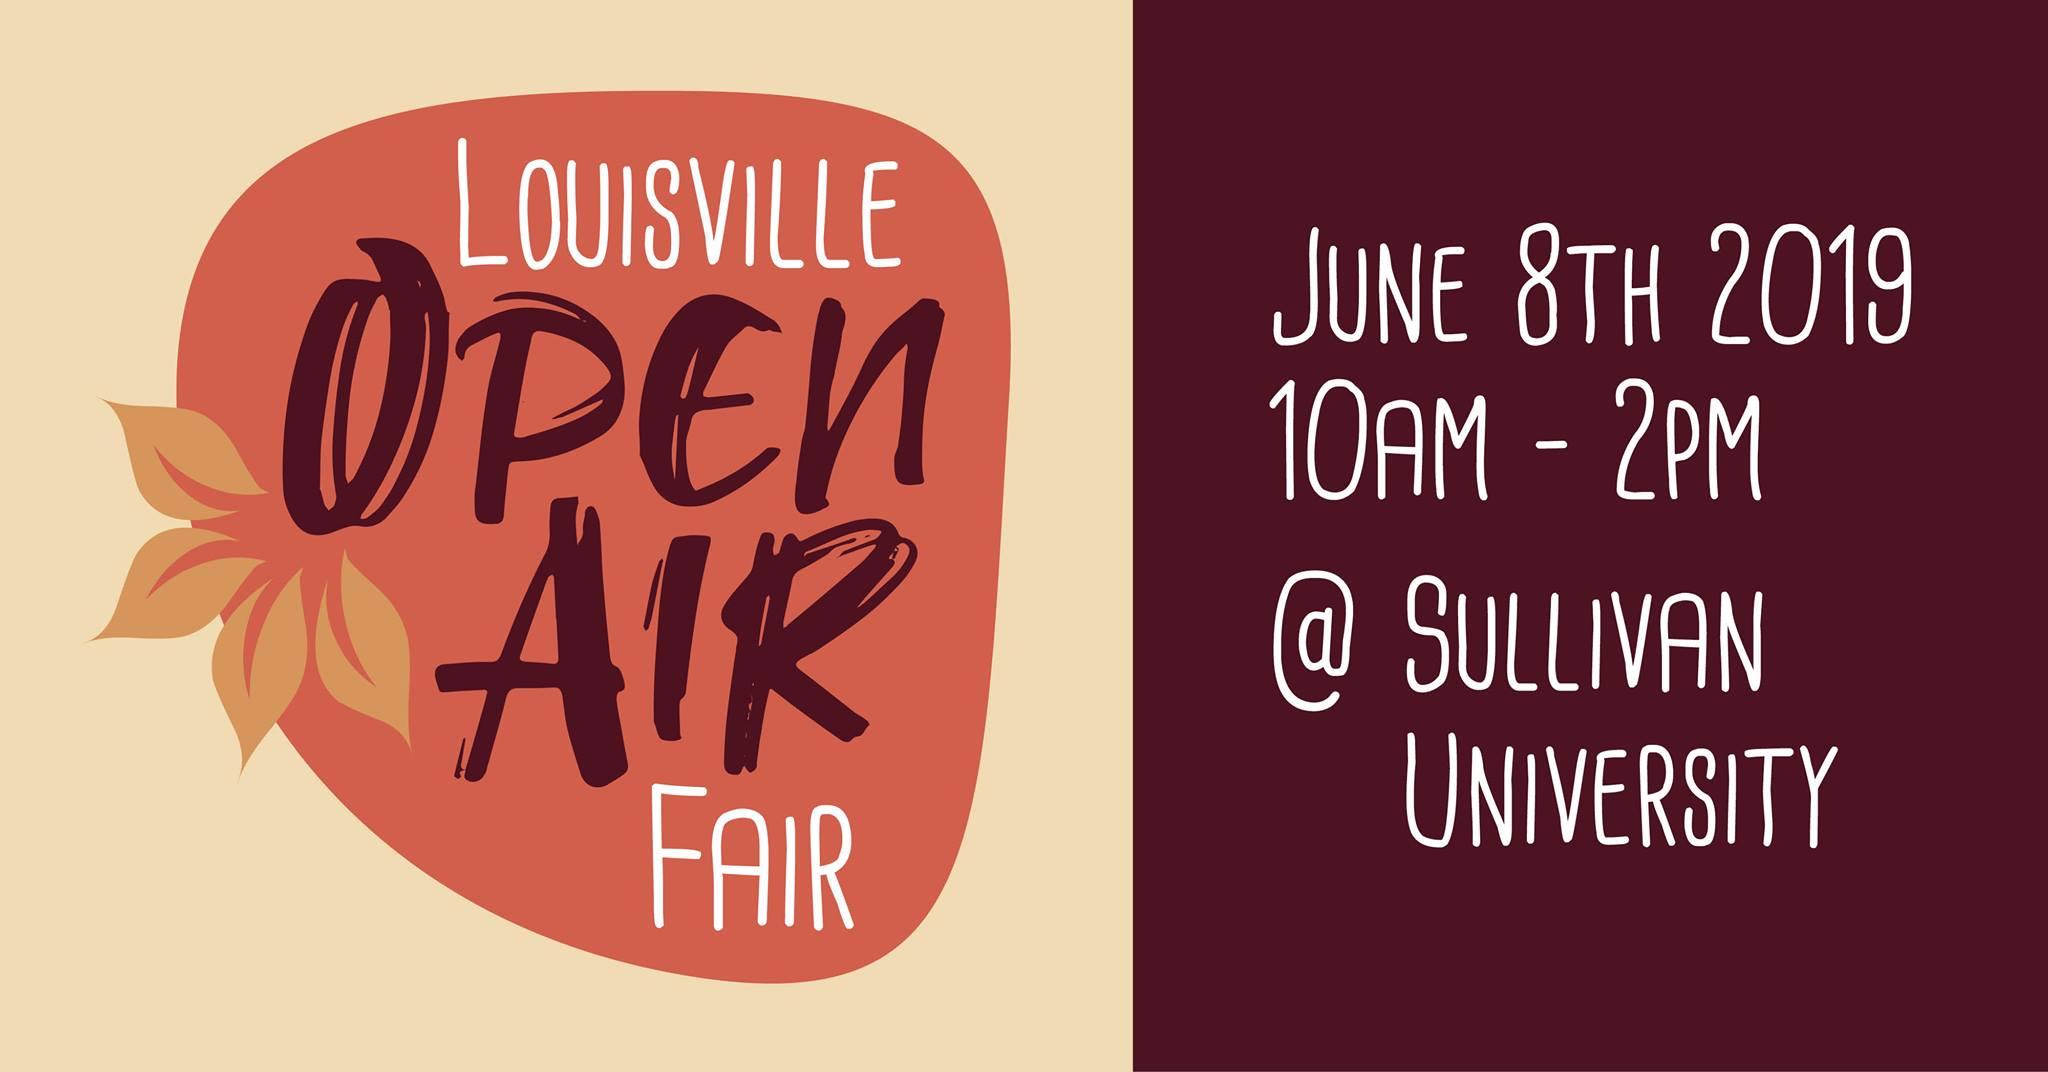 Louisville Open Air Fair